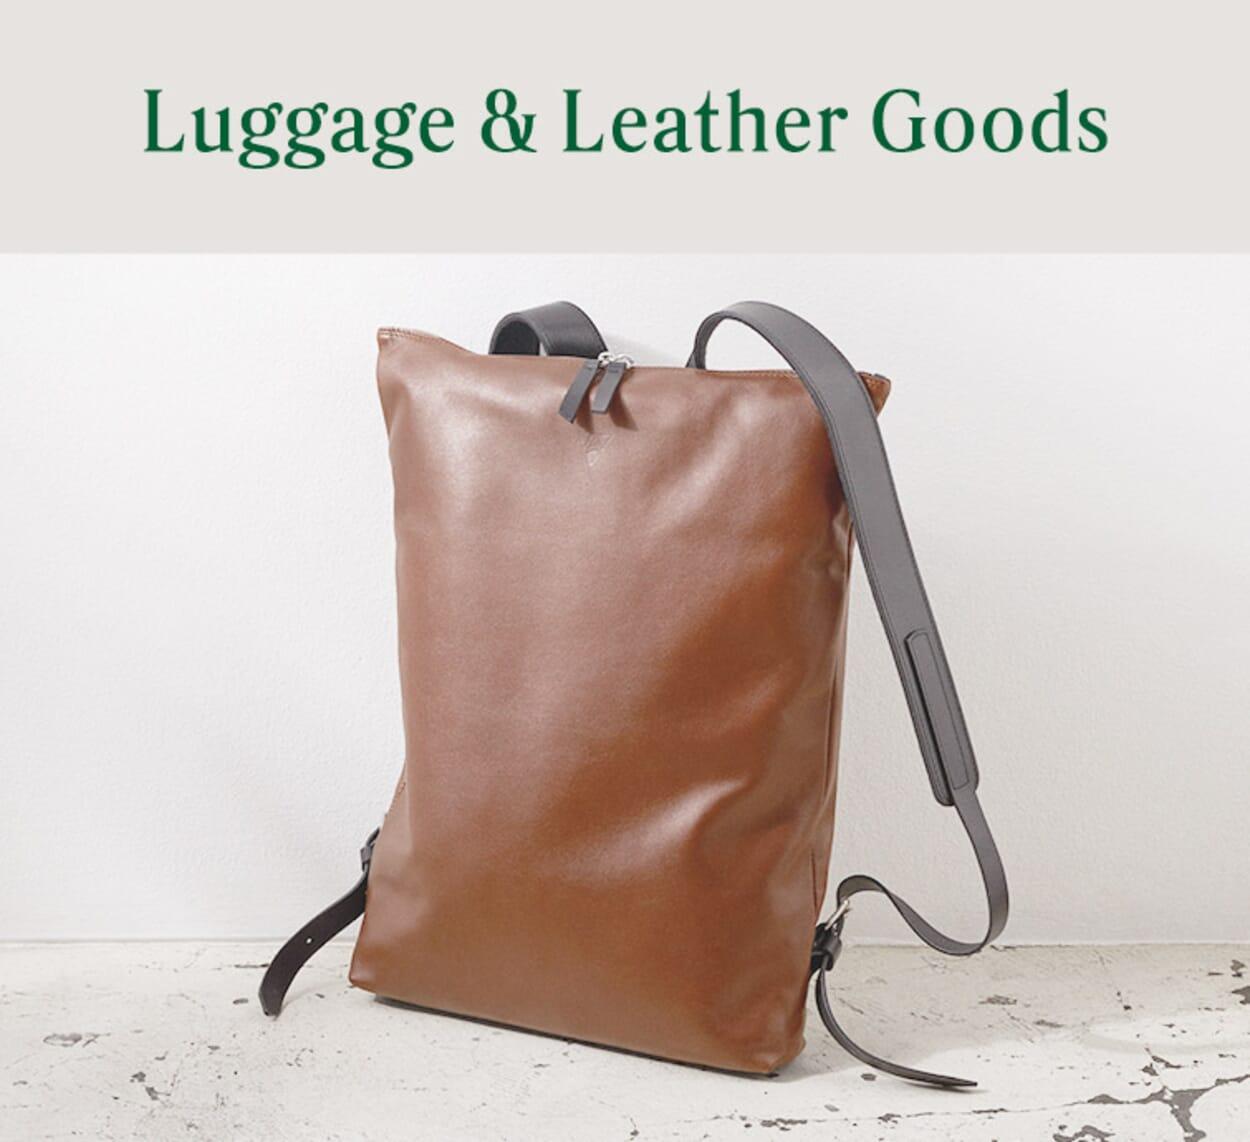 Luggage & Leather Goods